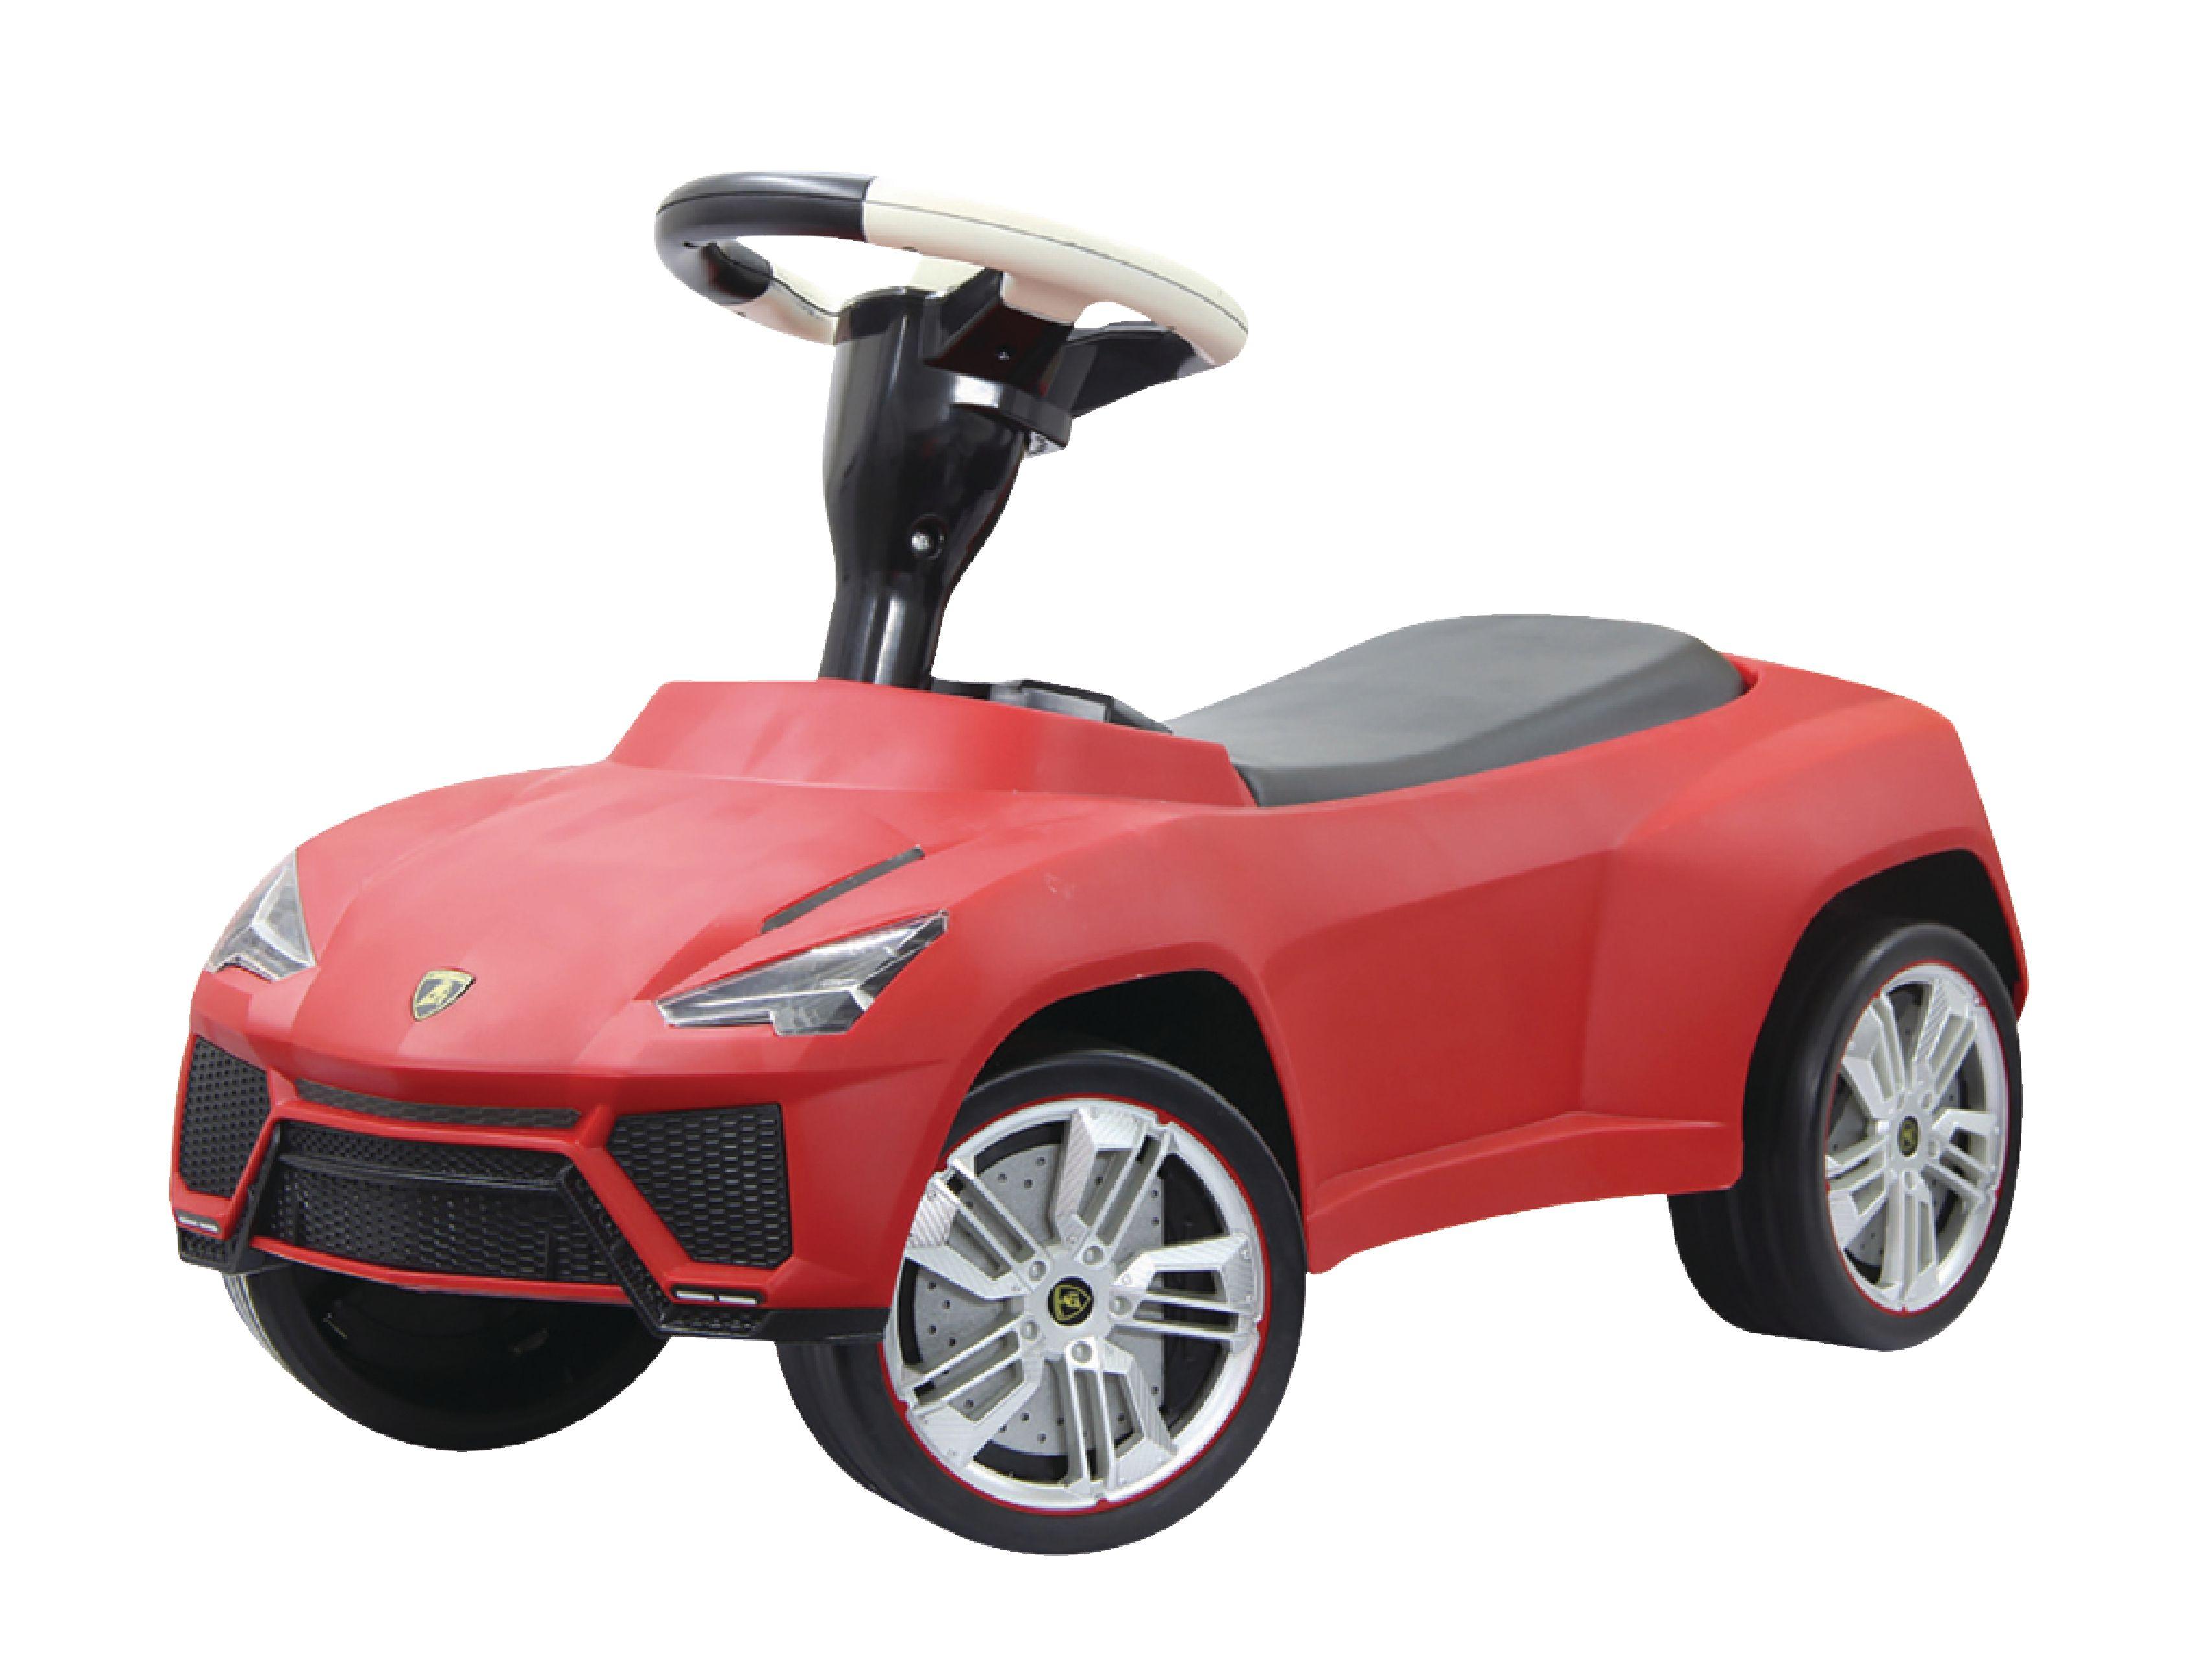 Dětské odstrkovadlo Lamborghini Ursus červené, Jamara JAM-460215